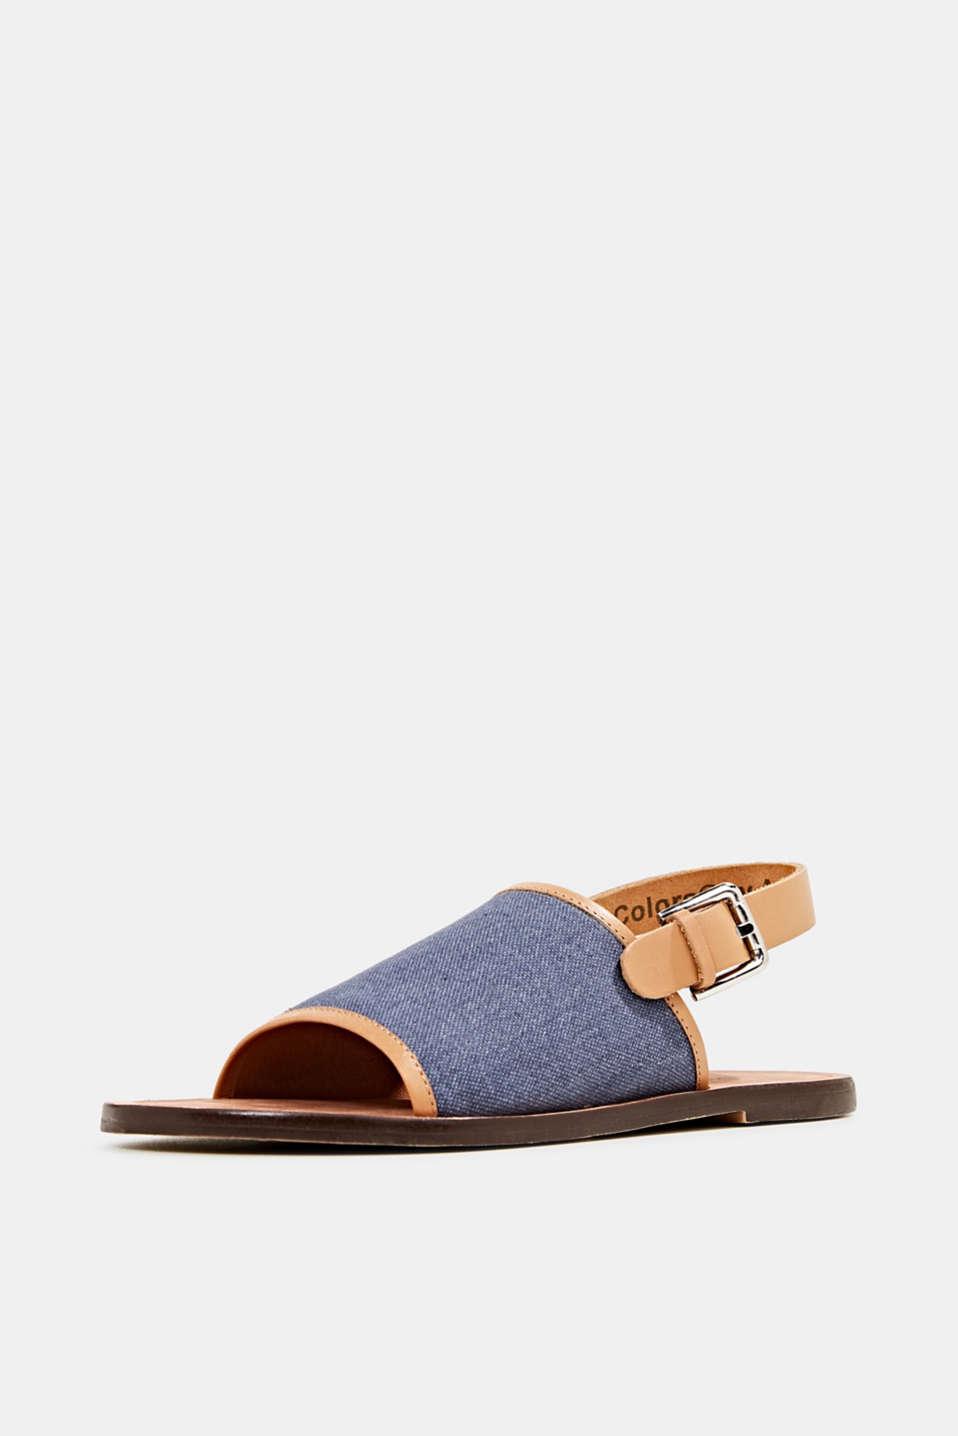 EarthColors® canvas sandals, LIGHT BLUE LAVENDER, detail image number 2